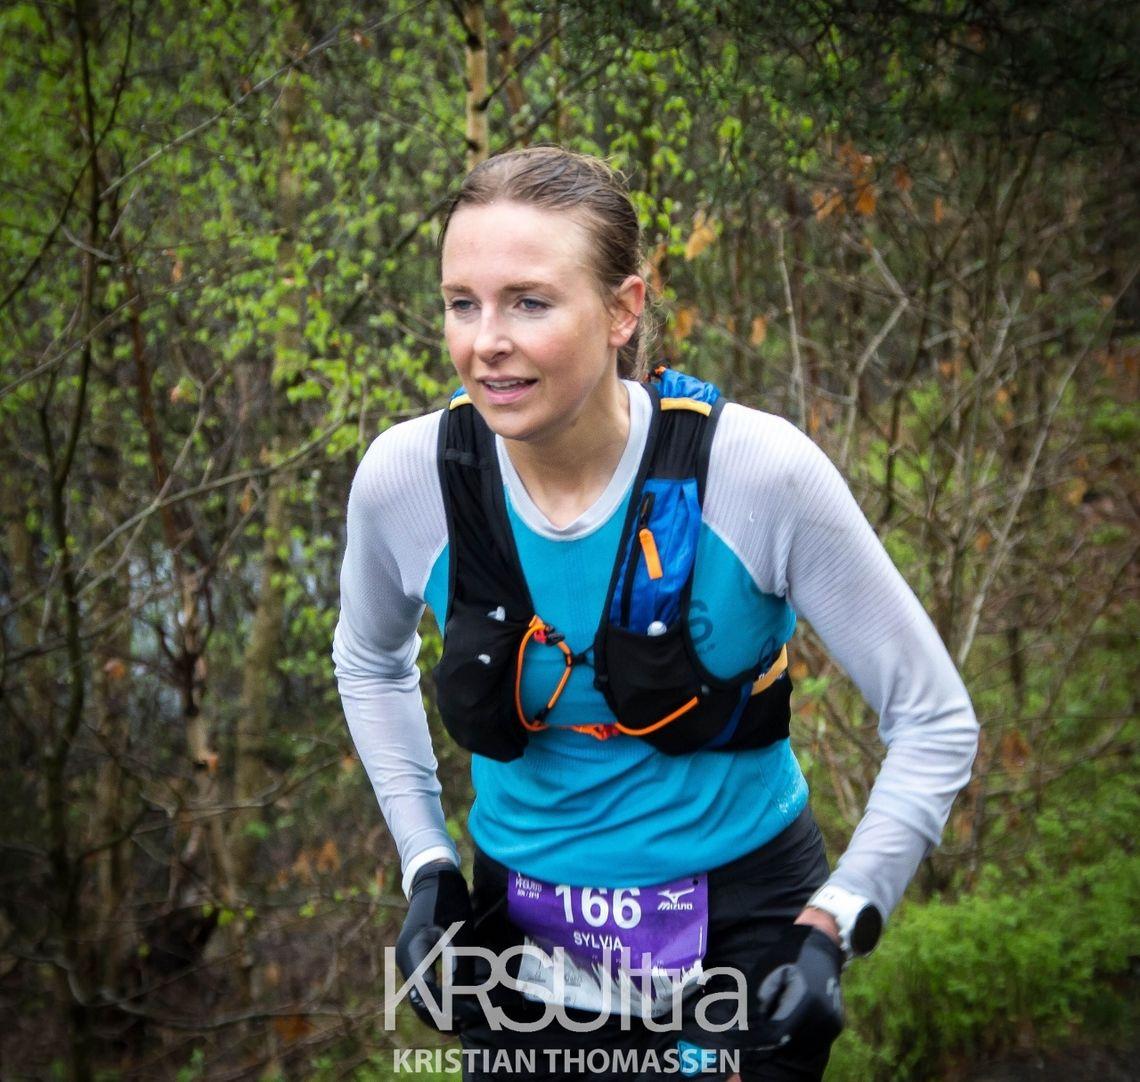 Sylvia Nordskar vant kvinneklassen overlegent. (Foto: KRSUltra/Kristian Thomassen)